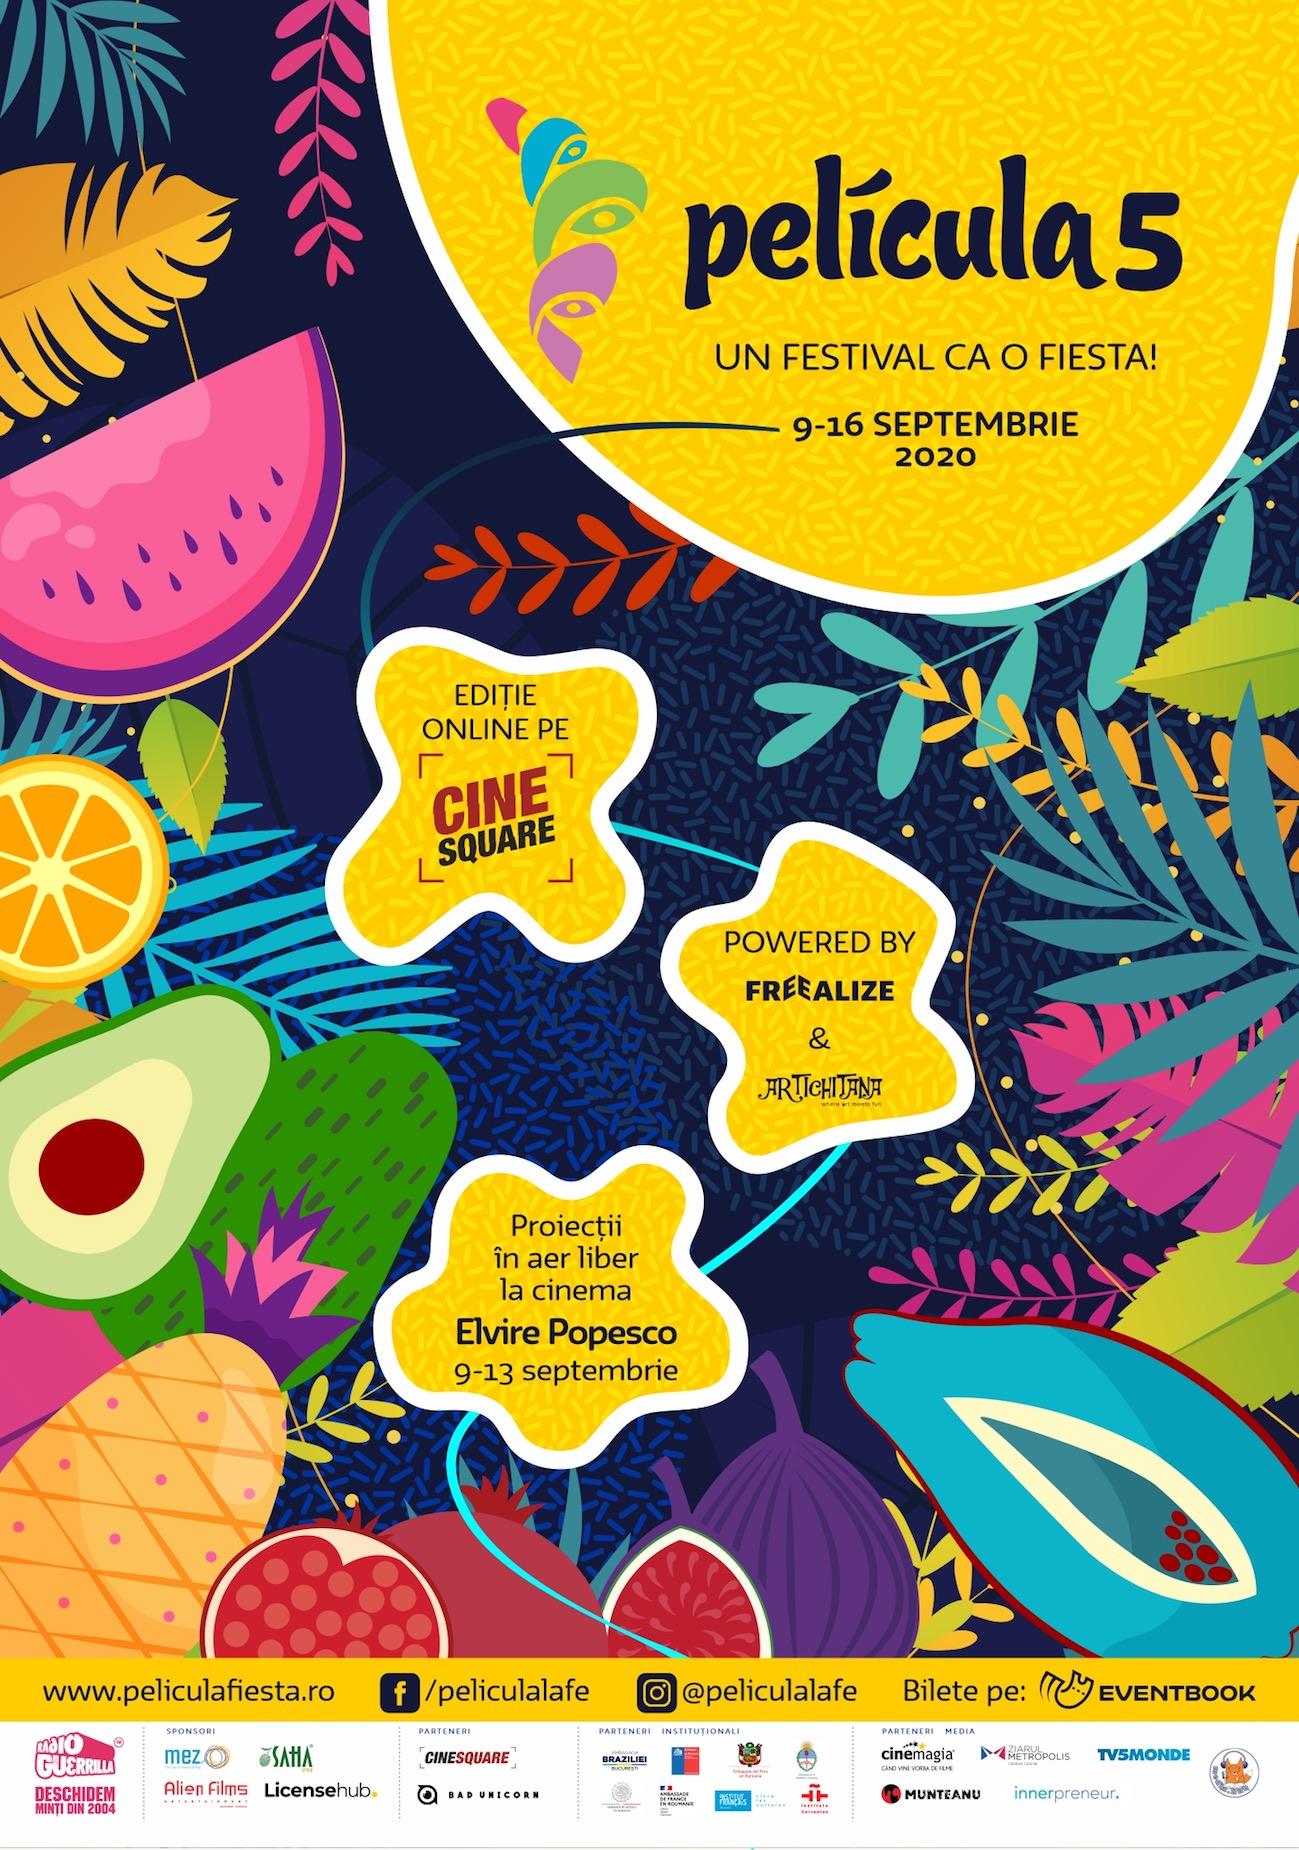 {focus_keyword} Proiecții în aer liber la a 5-a ediție Película 9-13 septembrie 2020, la Cinema Elvire Popesco afe231e9 b871 4927 b7a8 bcbf9d8f2db3